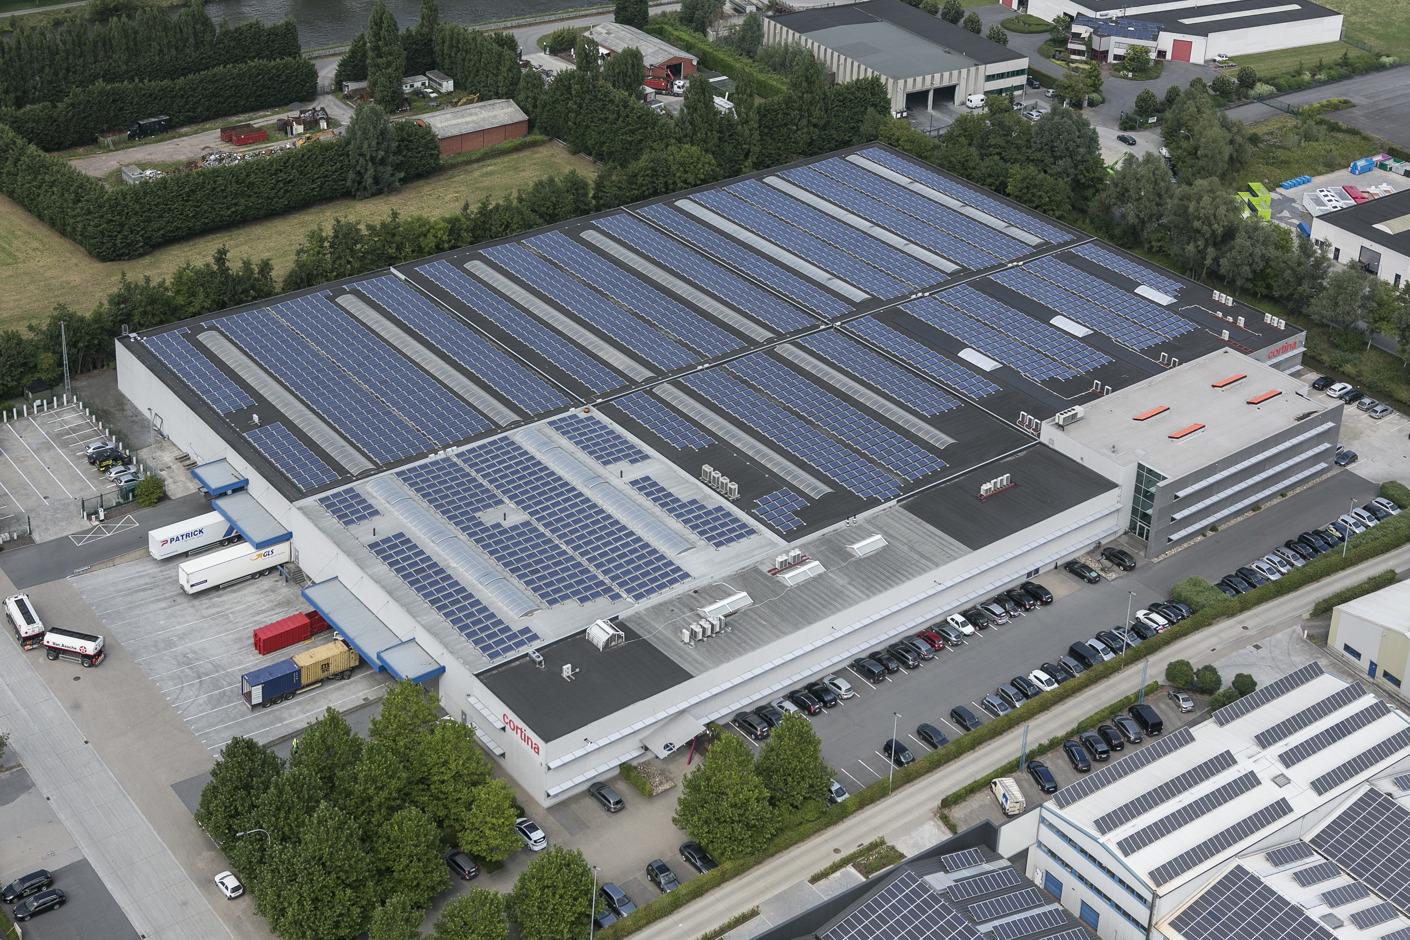 Eneco grootste zonne-energieproducent van België